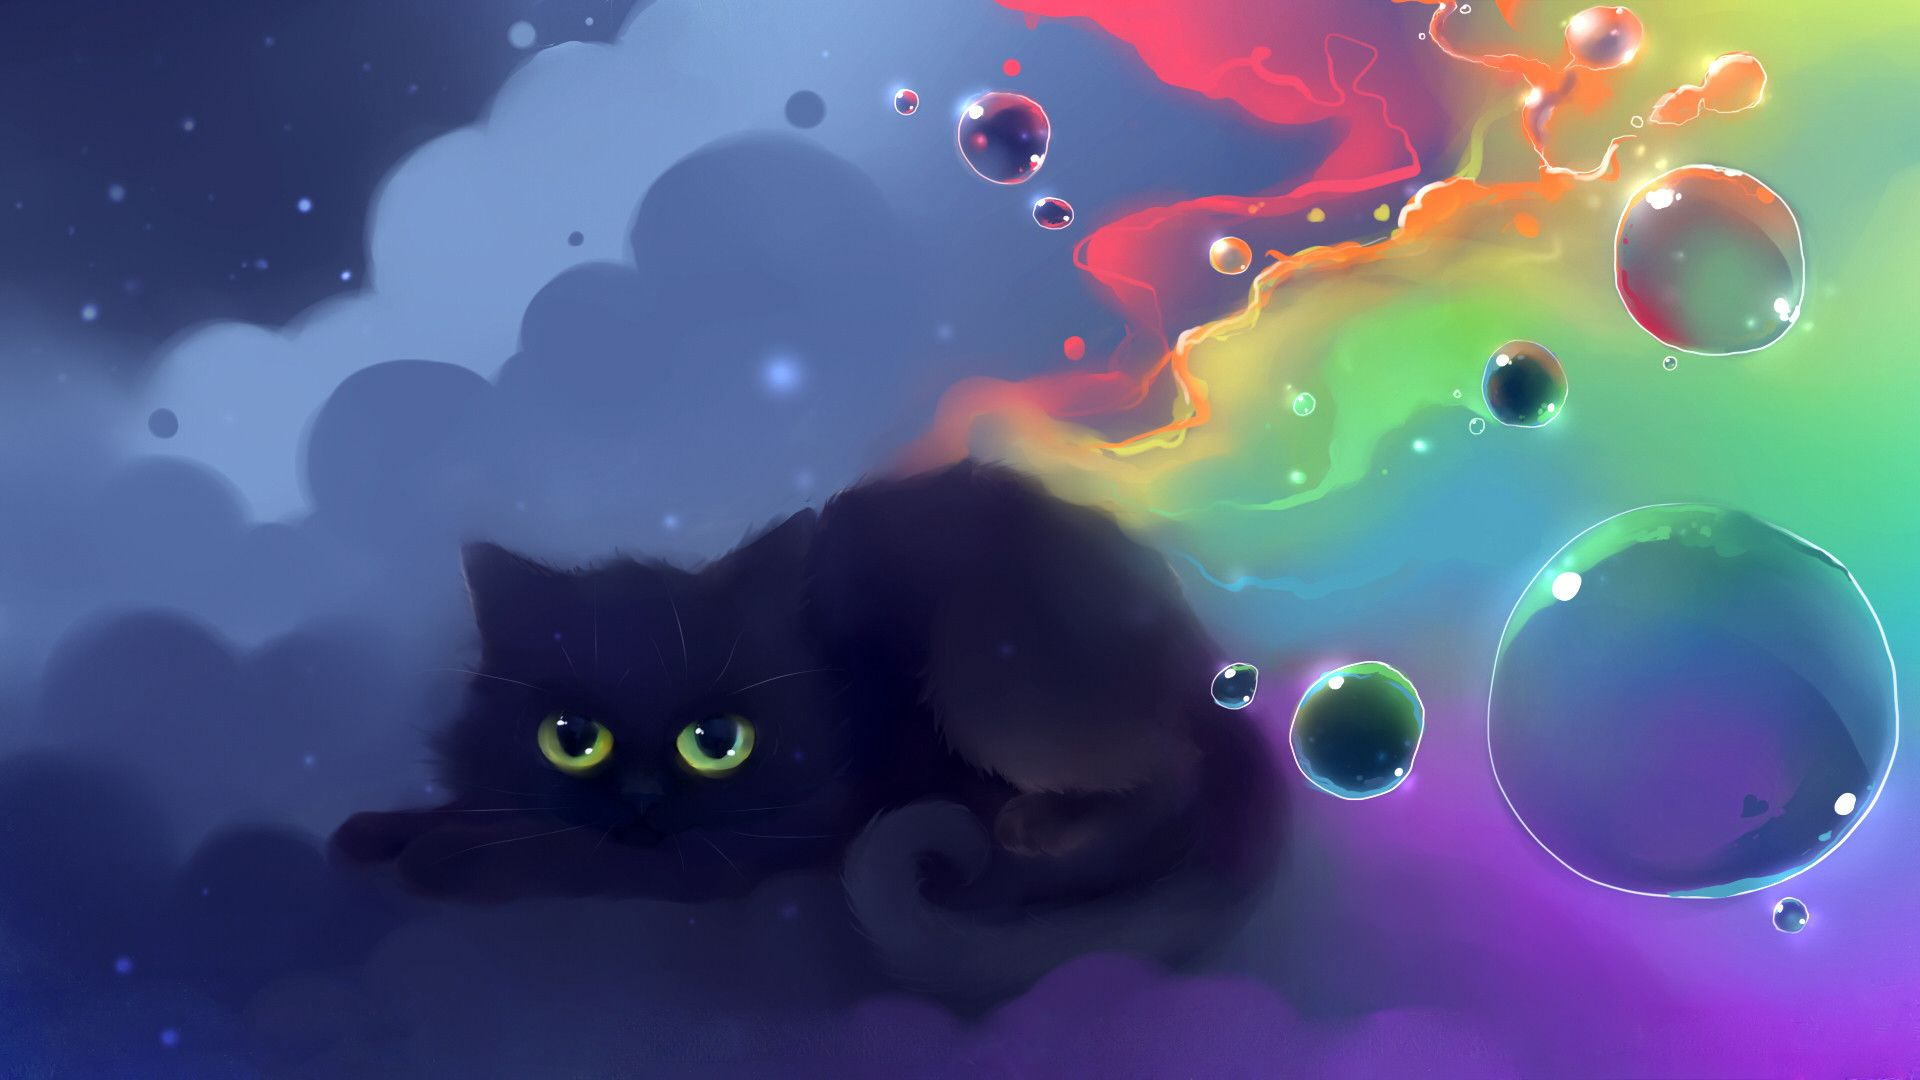 Res 1920x1080 Cartoon Cat Desktop Wallpaper Cat Wallpaper Cat Background Anime Cat